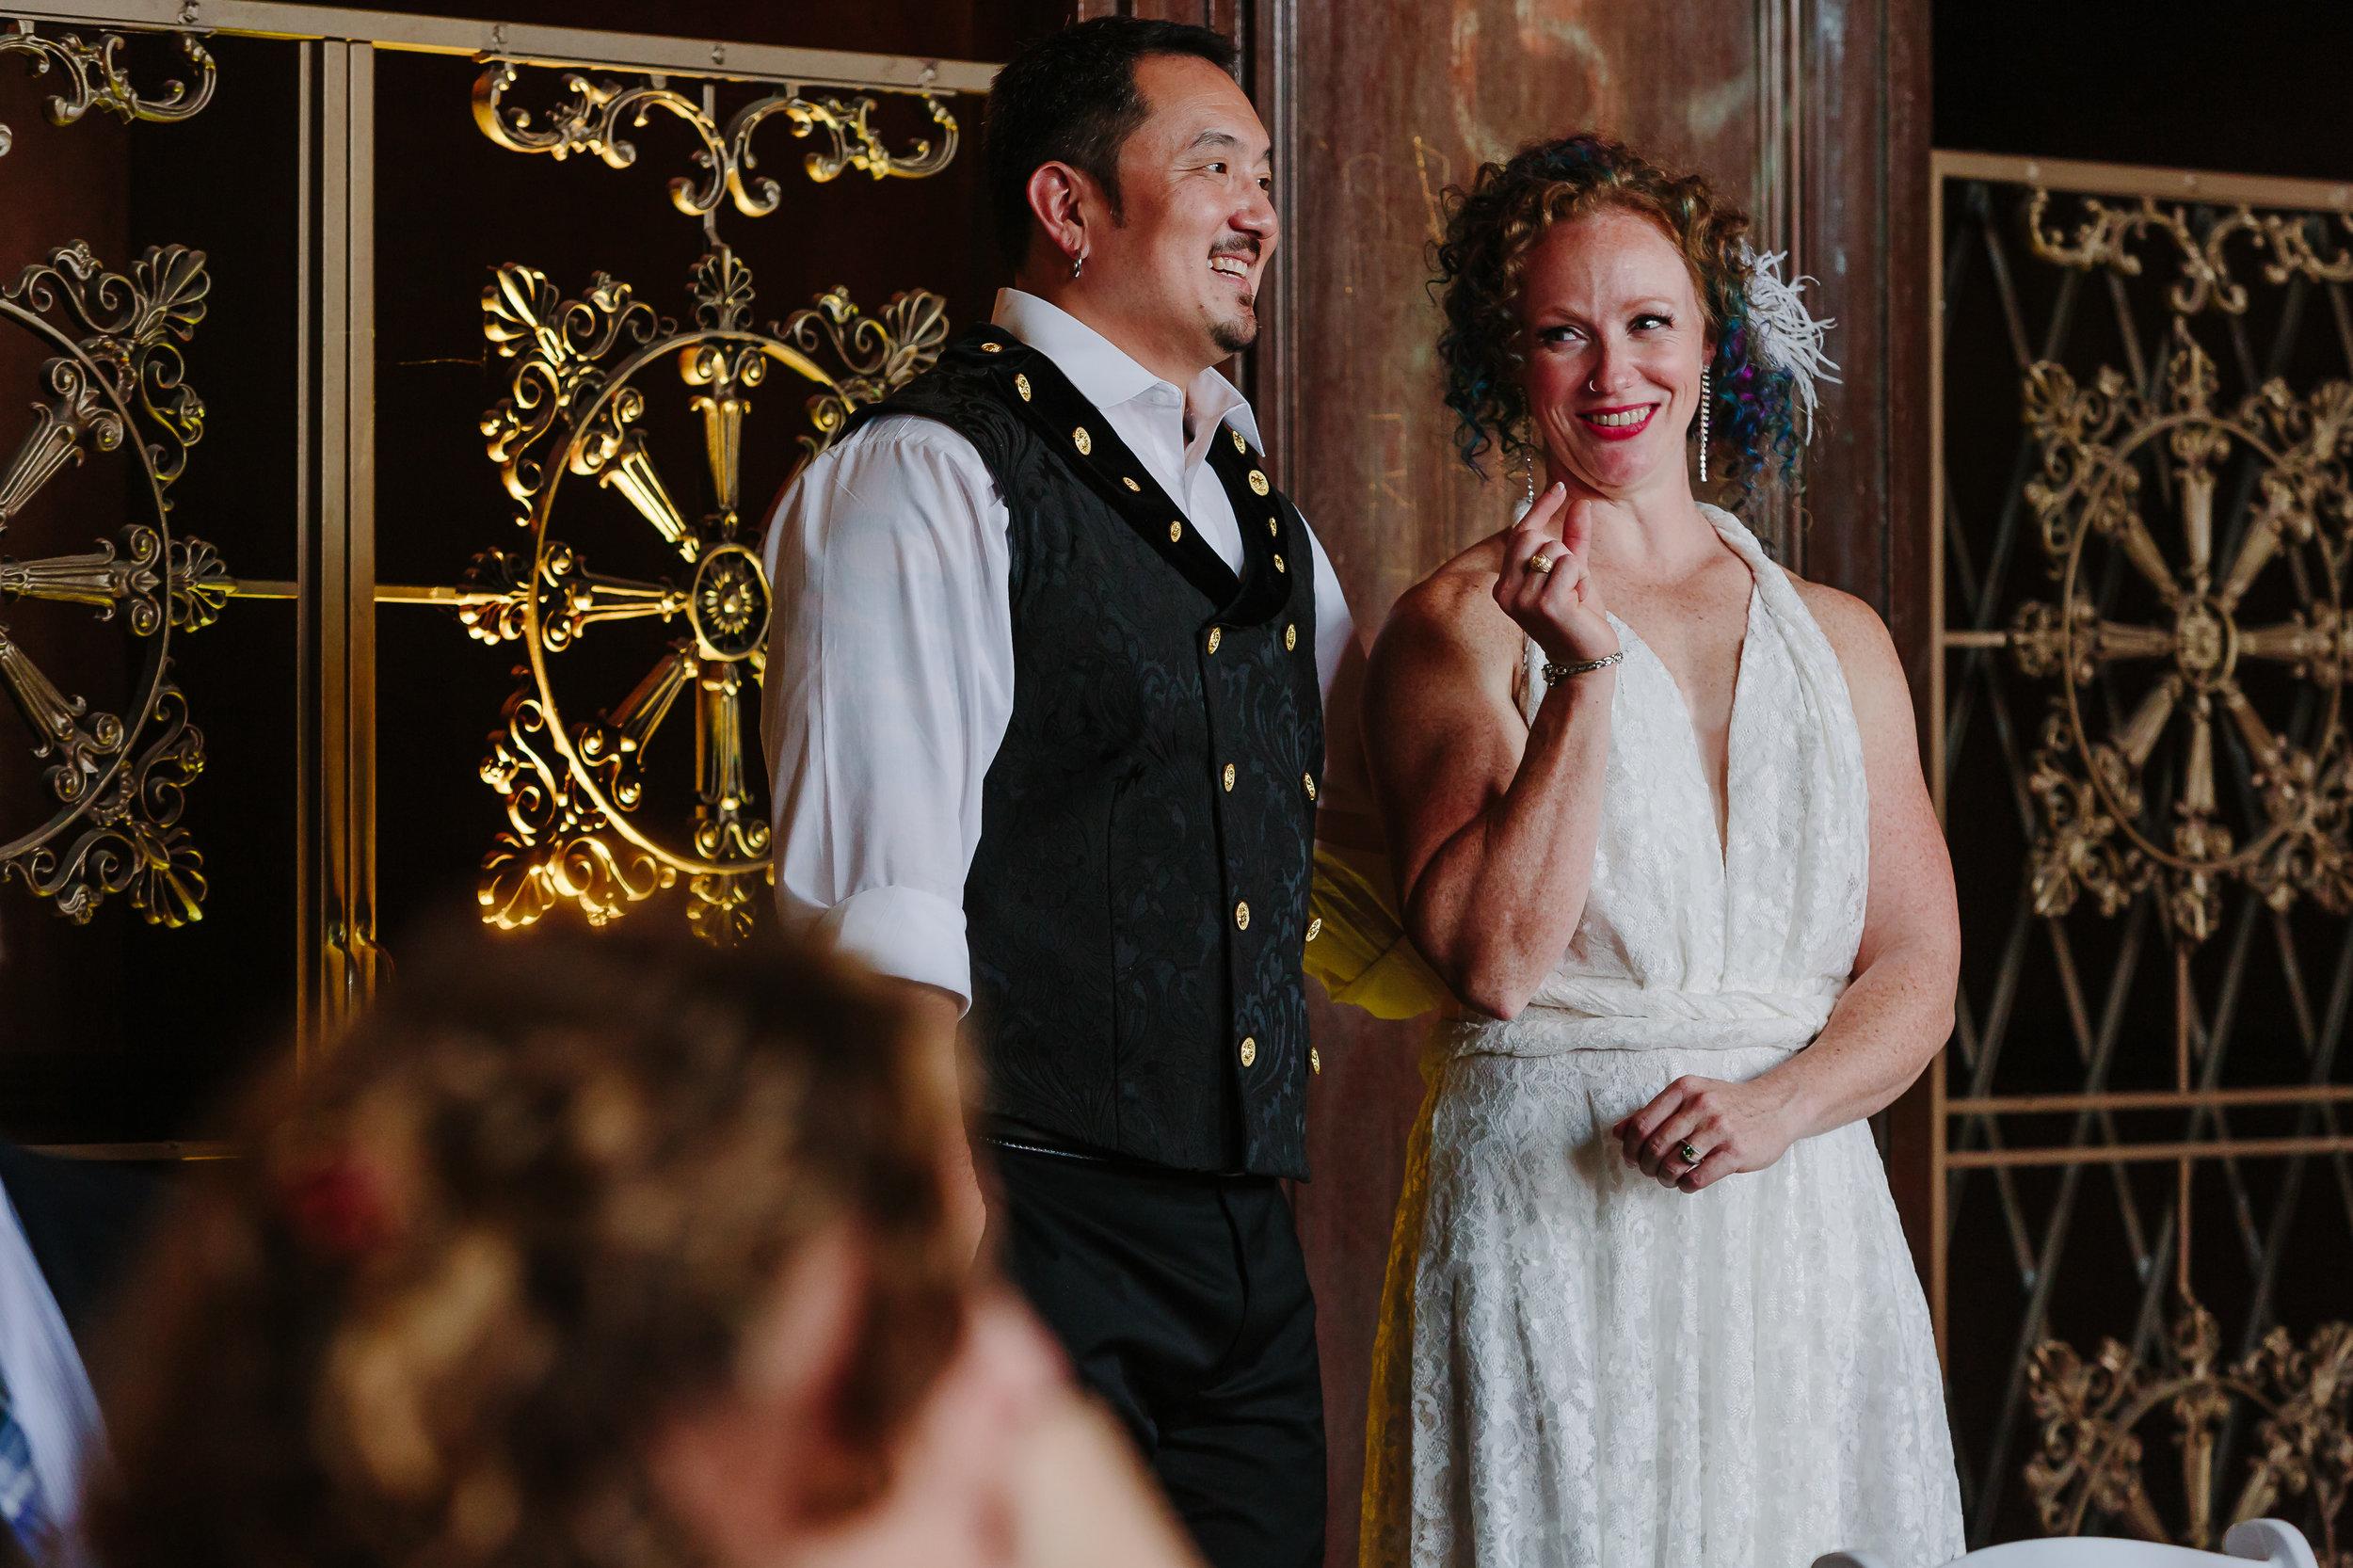 Kristin&MattWedding-0676.jpg